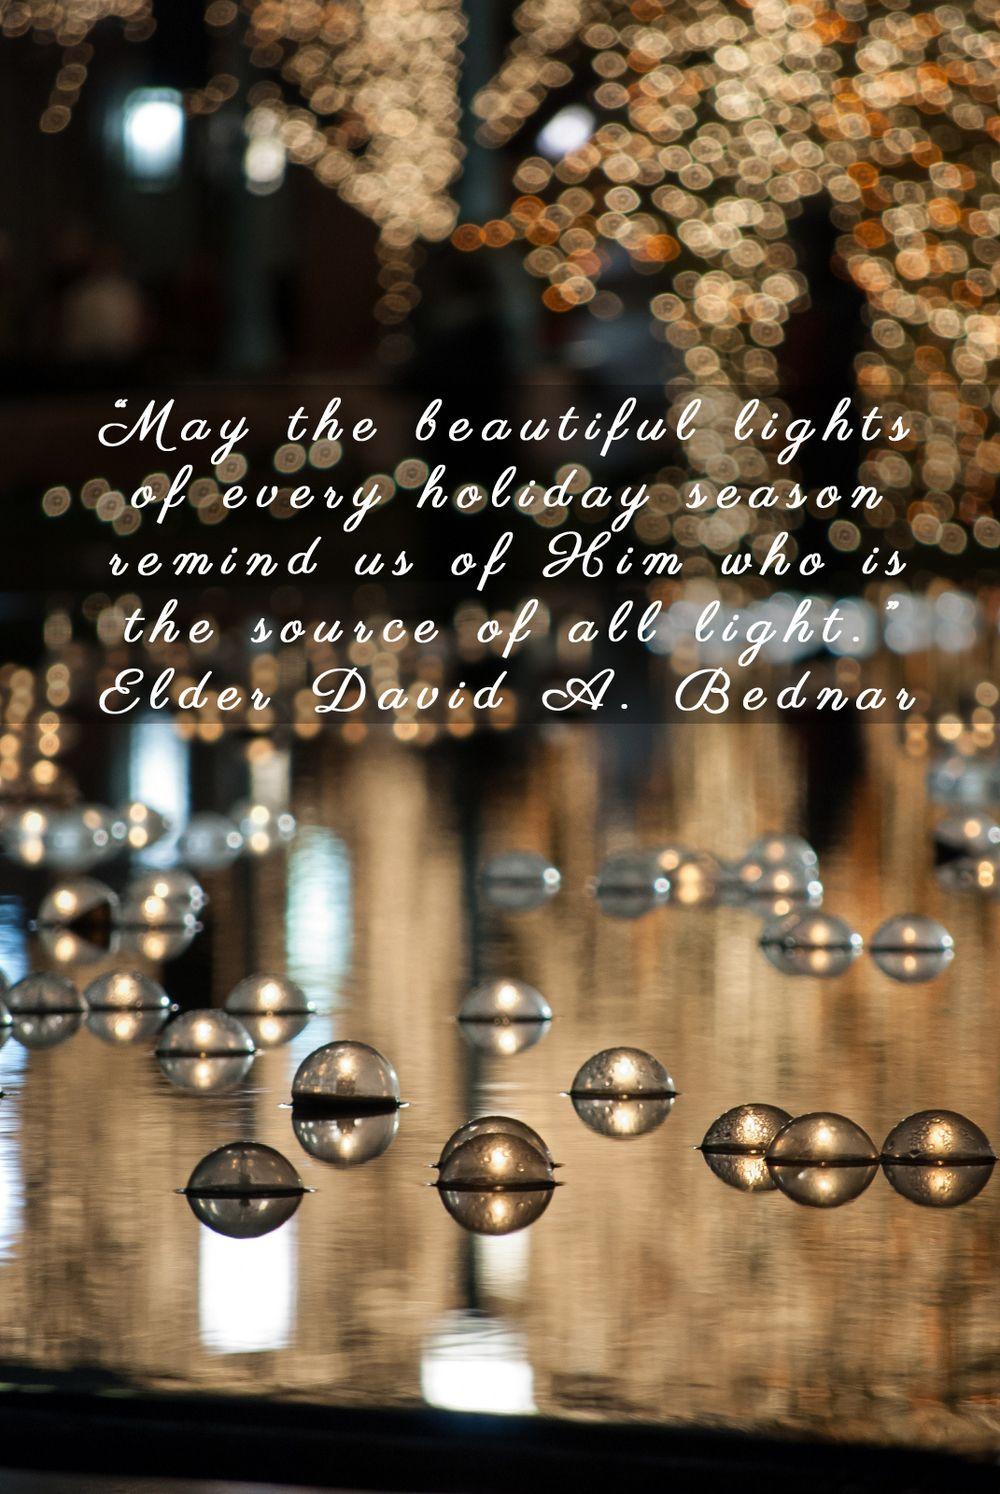 Christmas Lights Quotes : christmas, lights, quotes, Coming, Christmas, Lights, Quotes,, Lights,